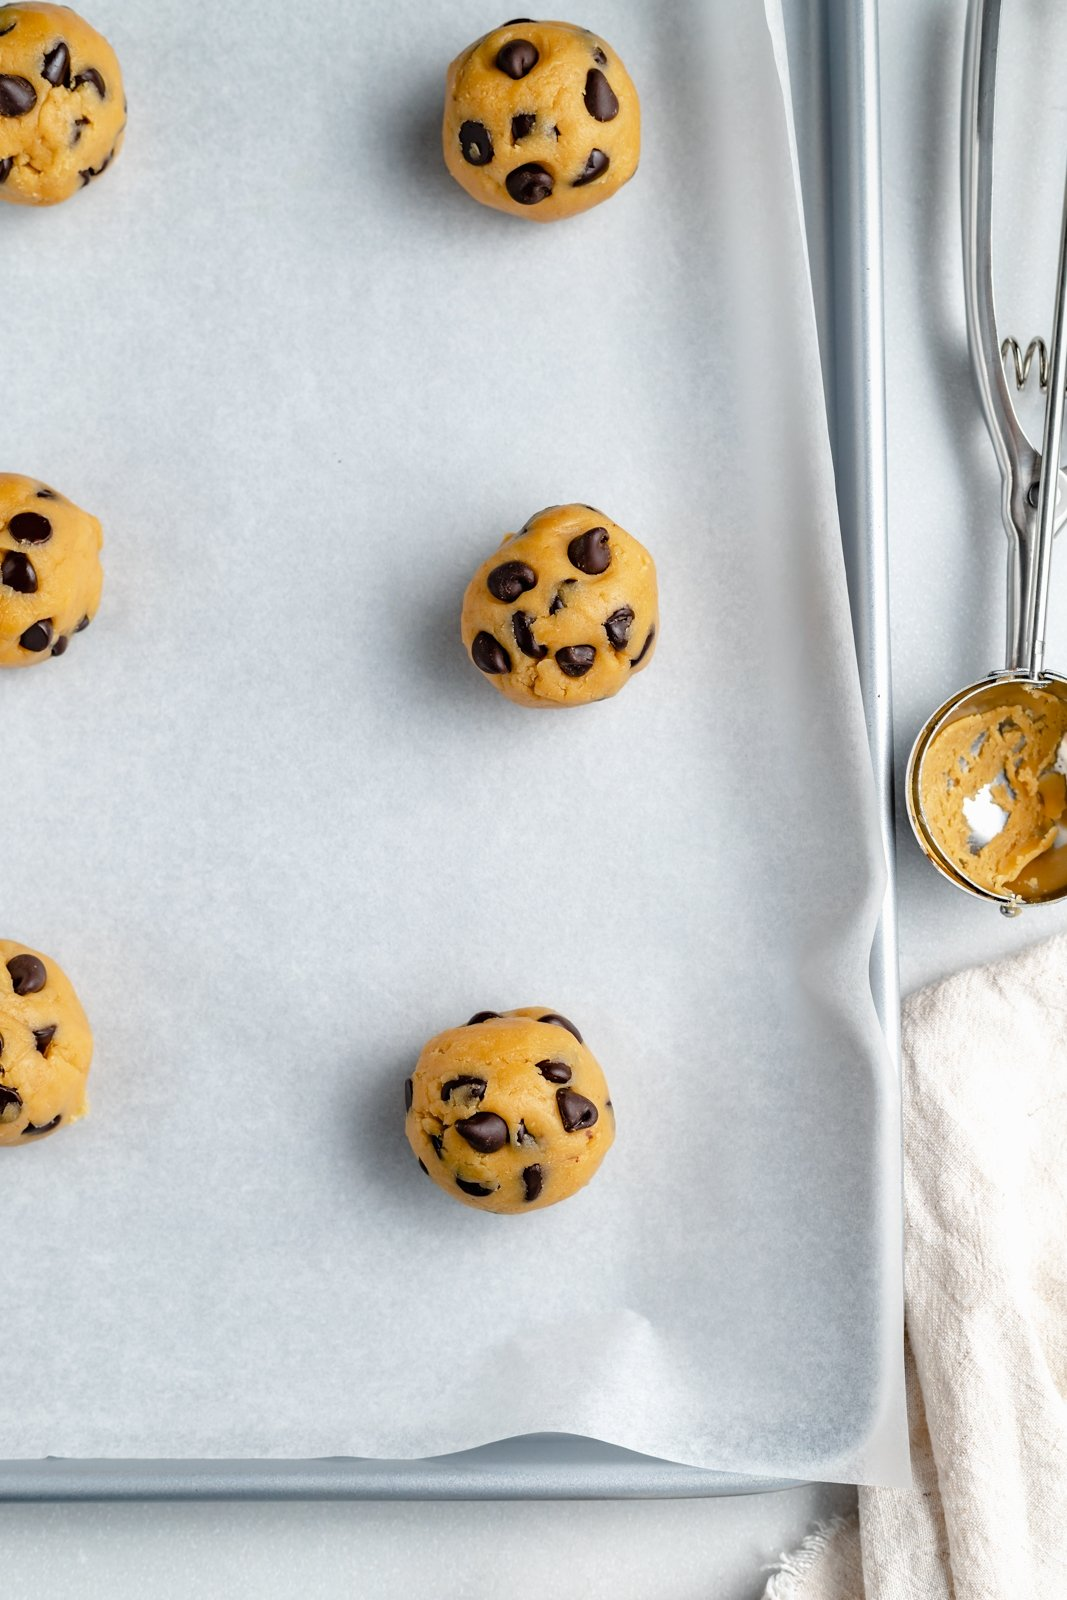 chickpea flour cookie dough balls on a baking tray